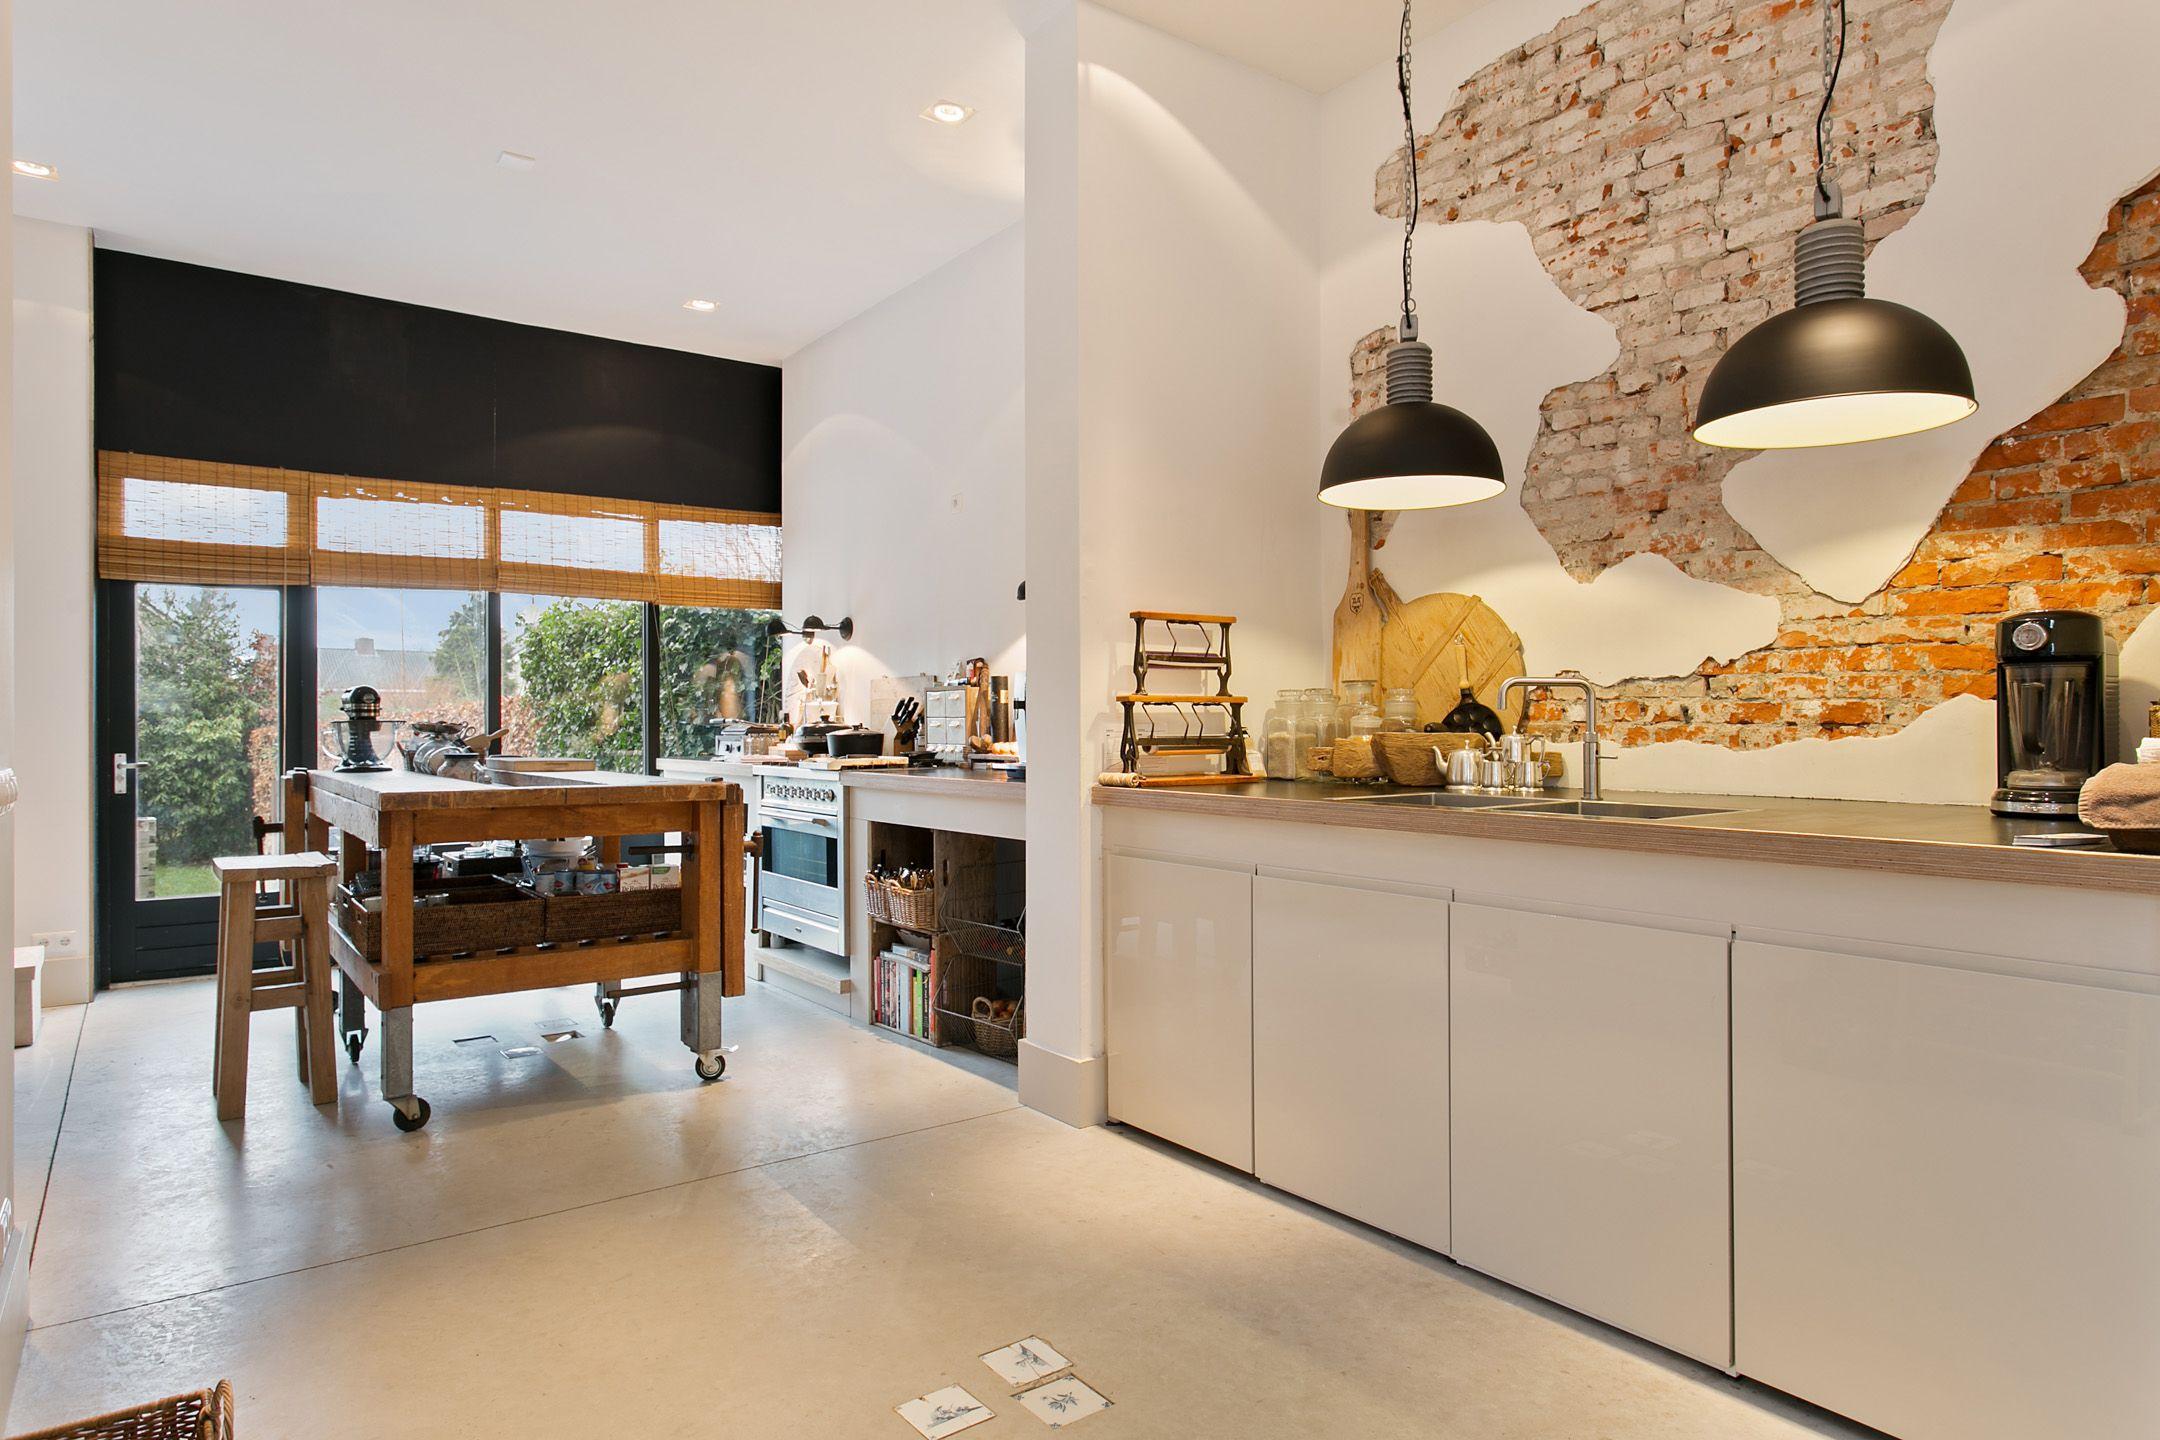 Stoere Werkbank Keuken : Werkbank keuken stalen werkbank keuken piet hein eek hoogte cm